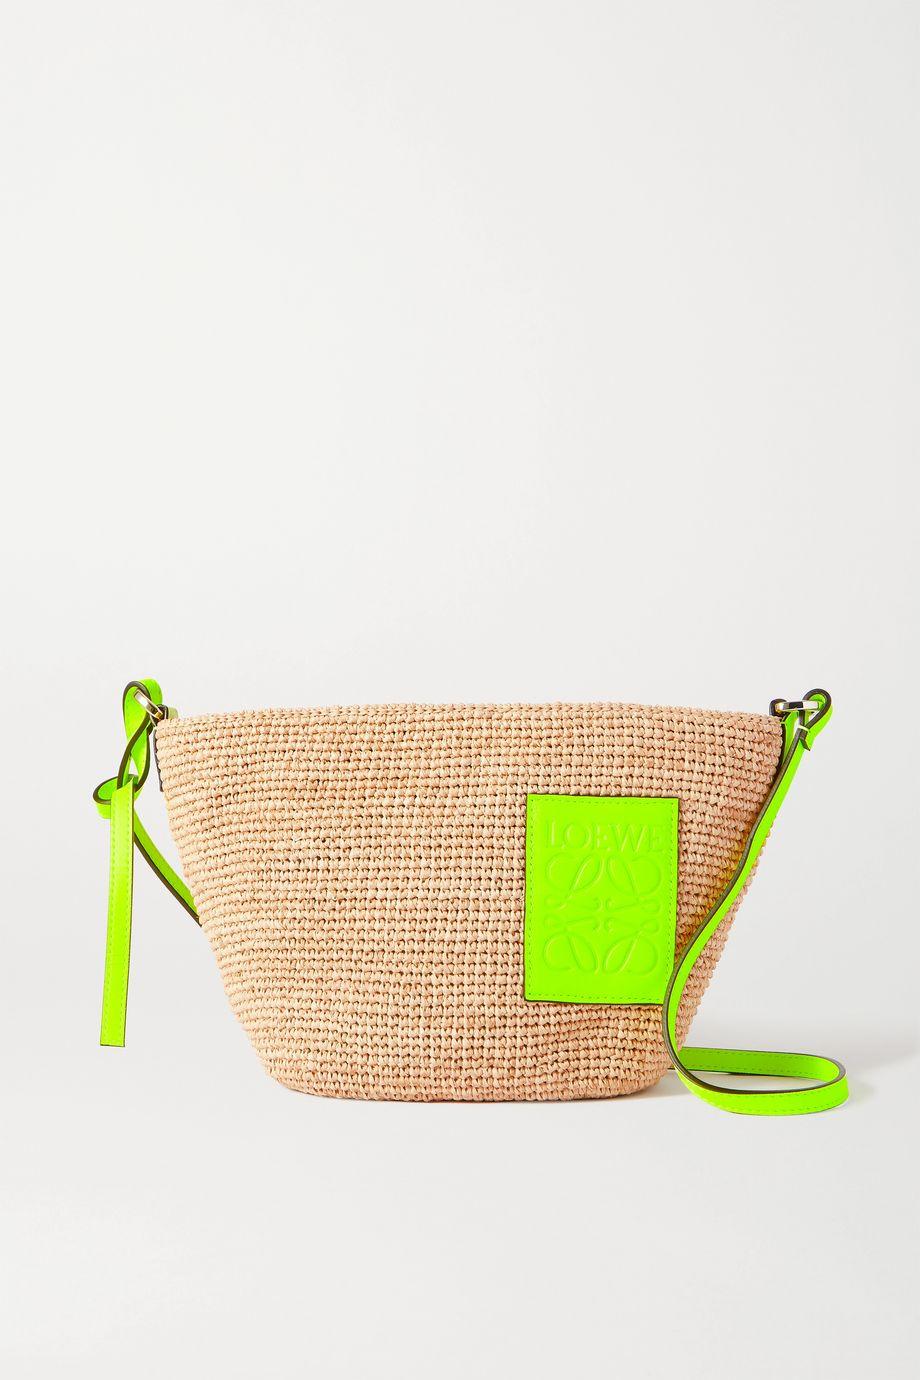 Loewe + Paula's Ibiza Pouchette leather-trimmed woven raffia shoulder bag